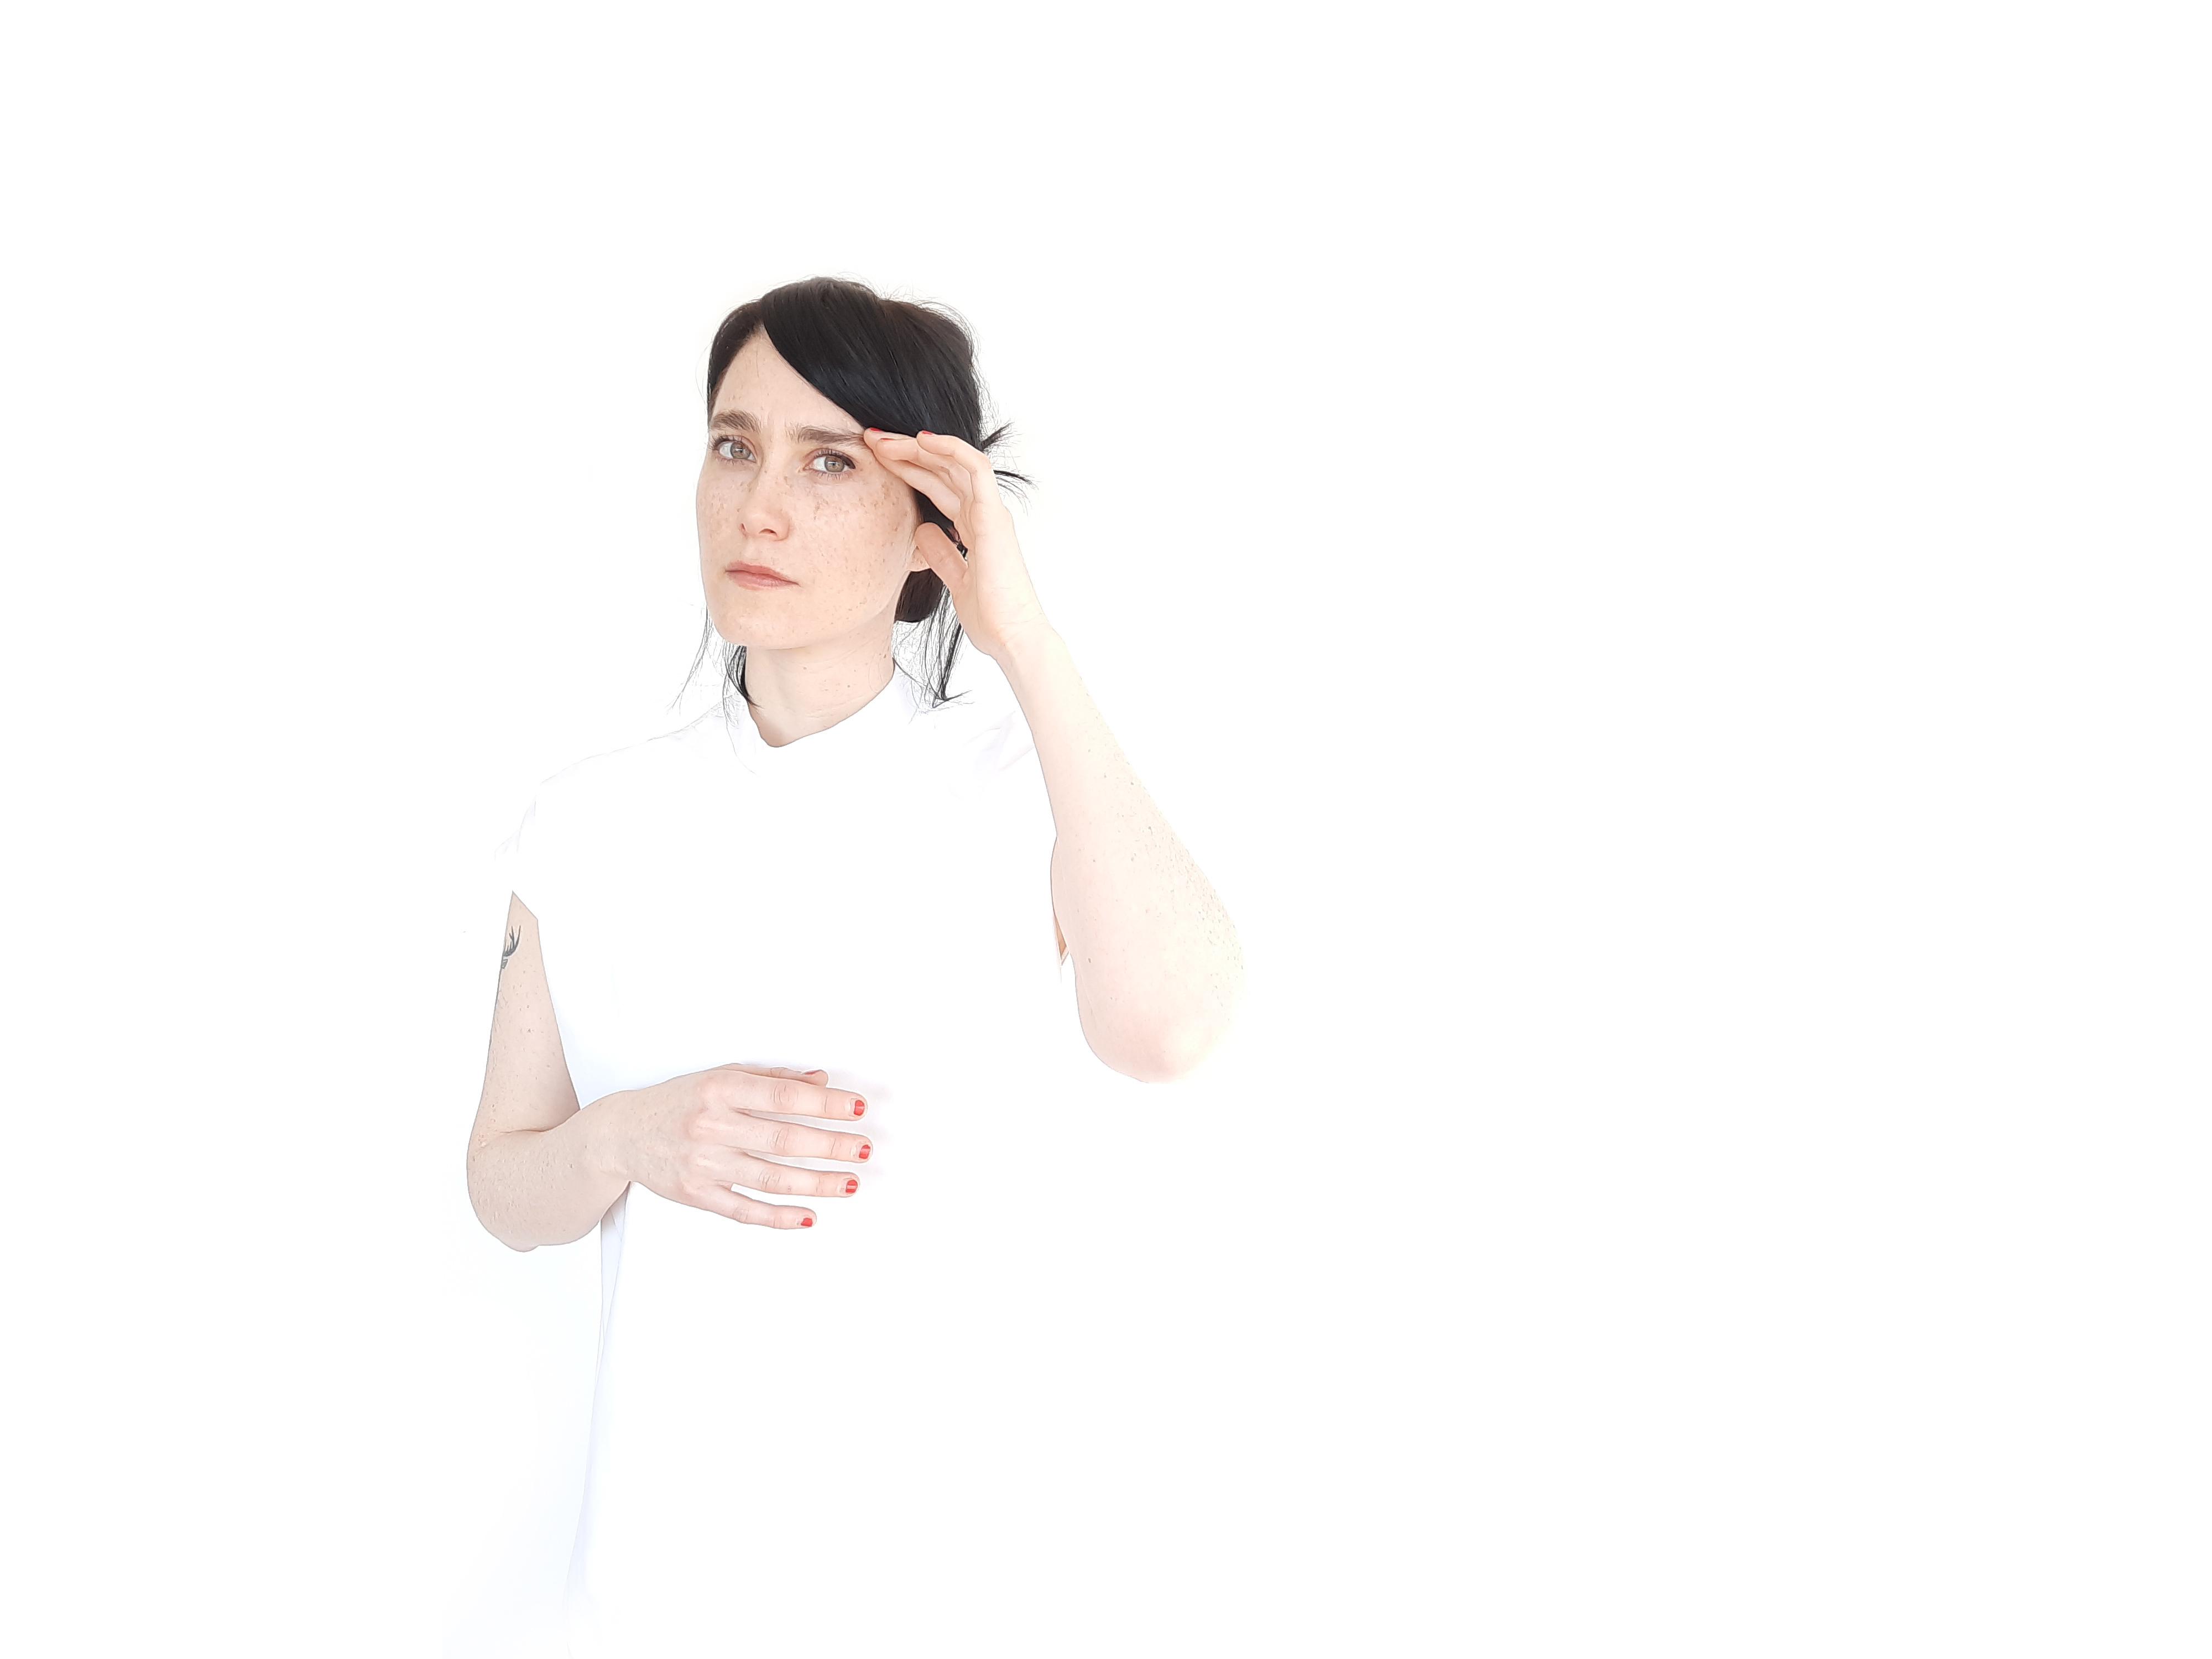 Agustina Bécares presenta Oscuridad